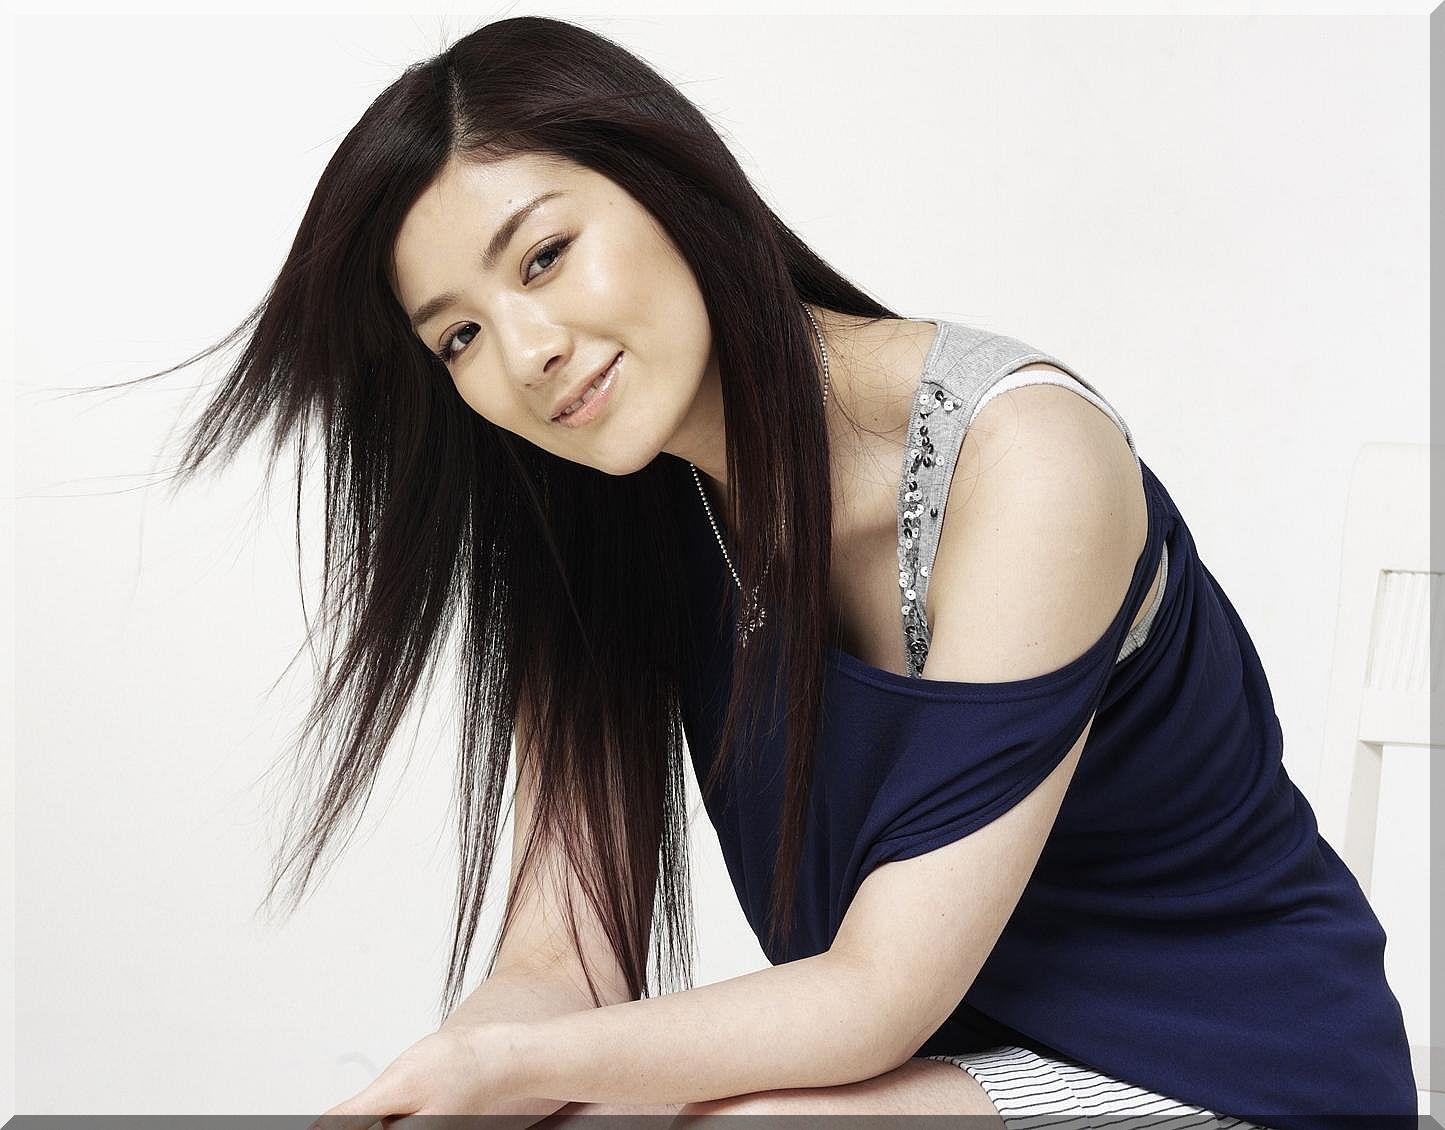 beautiful chinese women - Mobile wallpapers